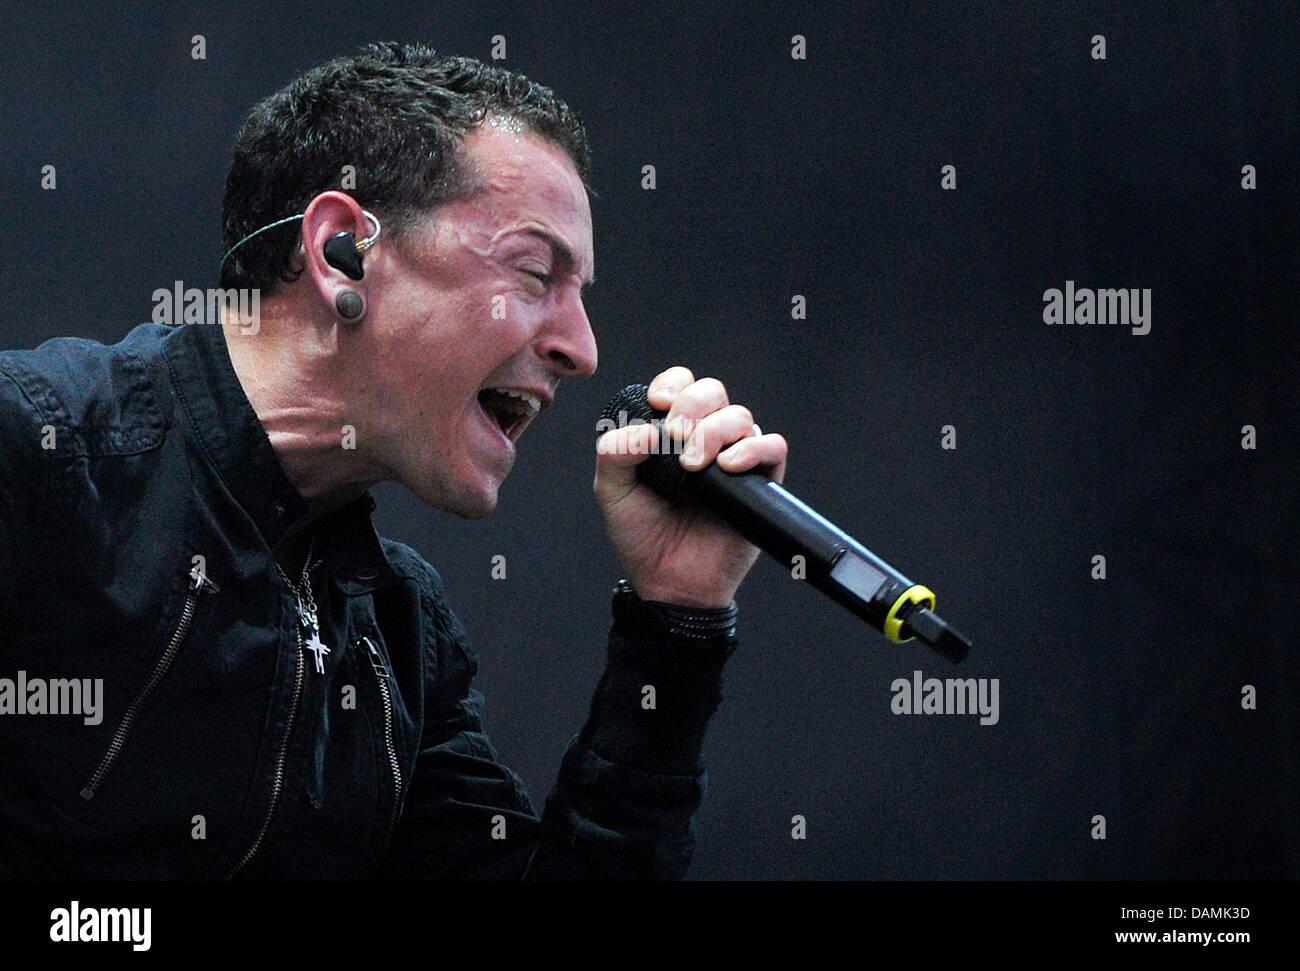 Musician Chester Bennington of the US band Linkin Park